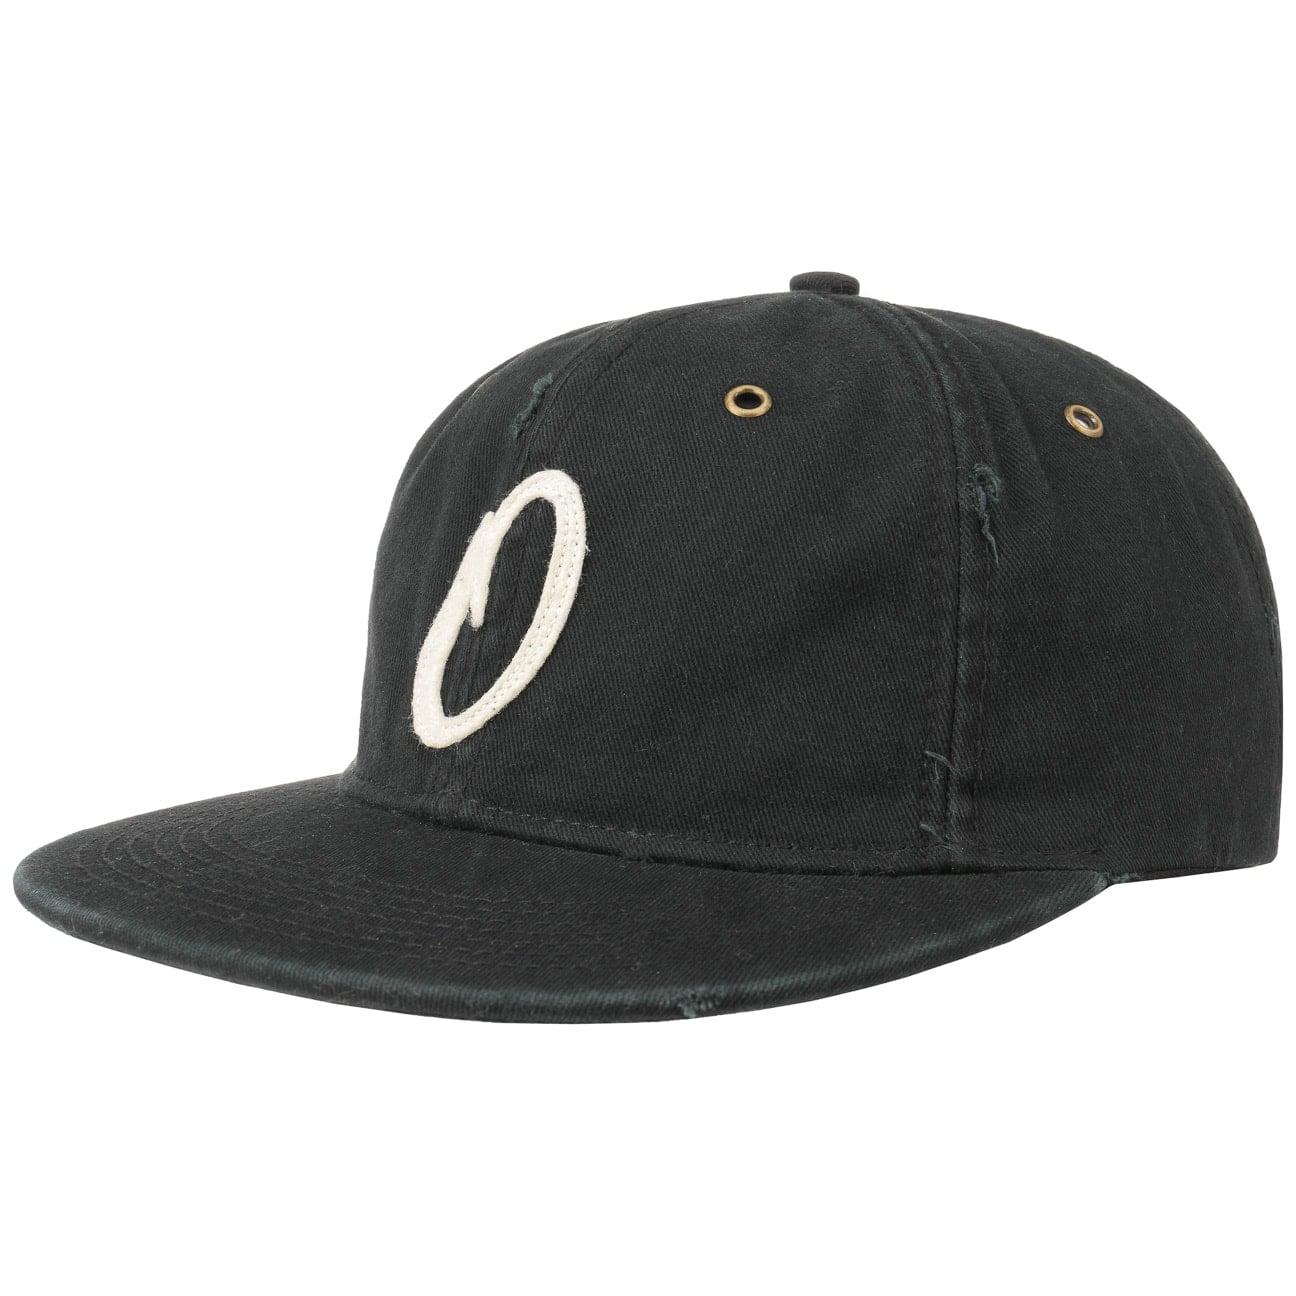 Casquette Rojo O Strapback by Official Headwear  baseball cap